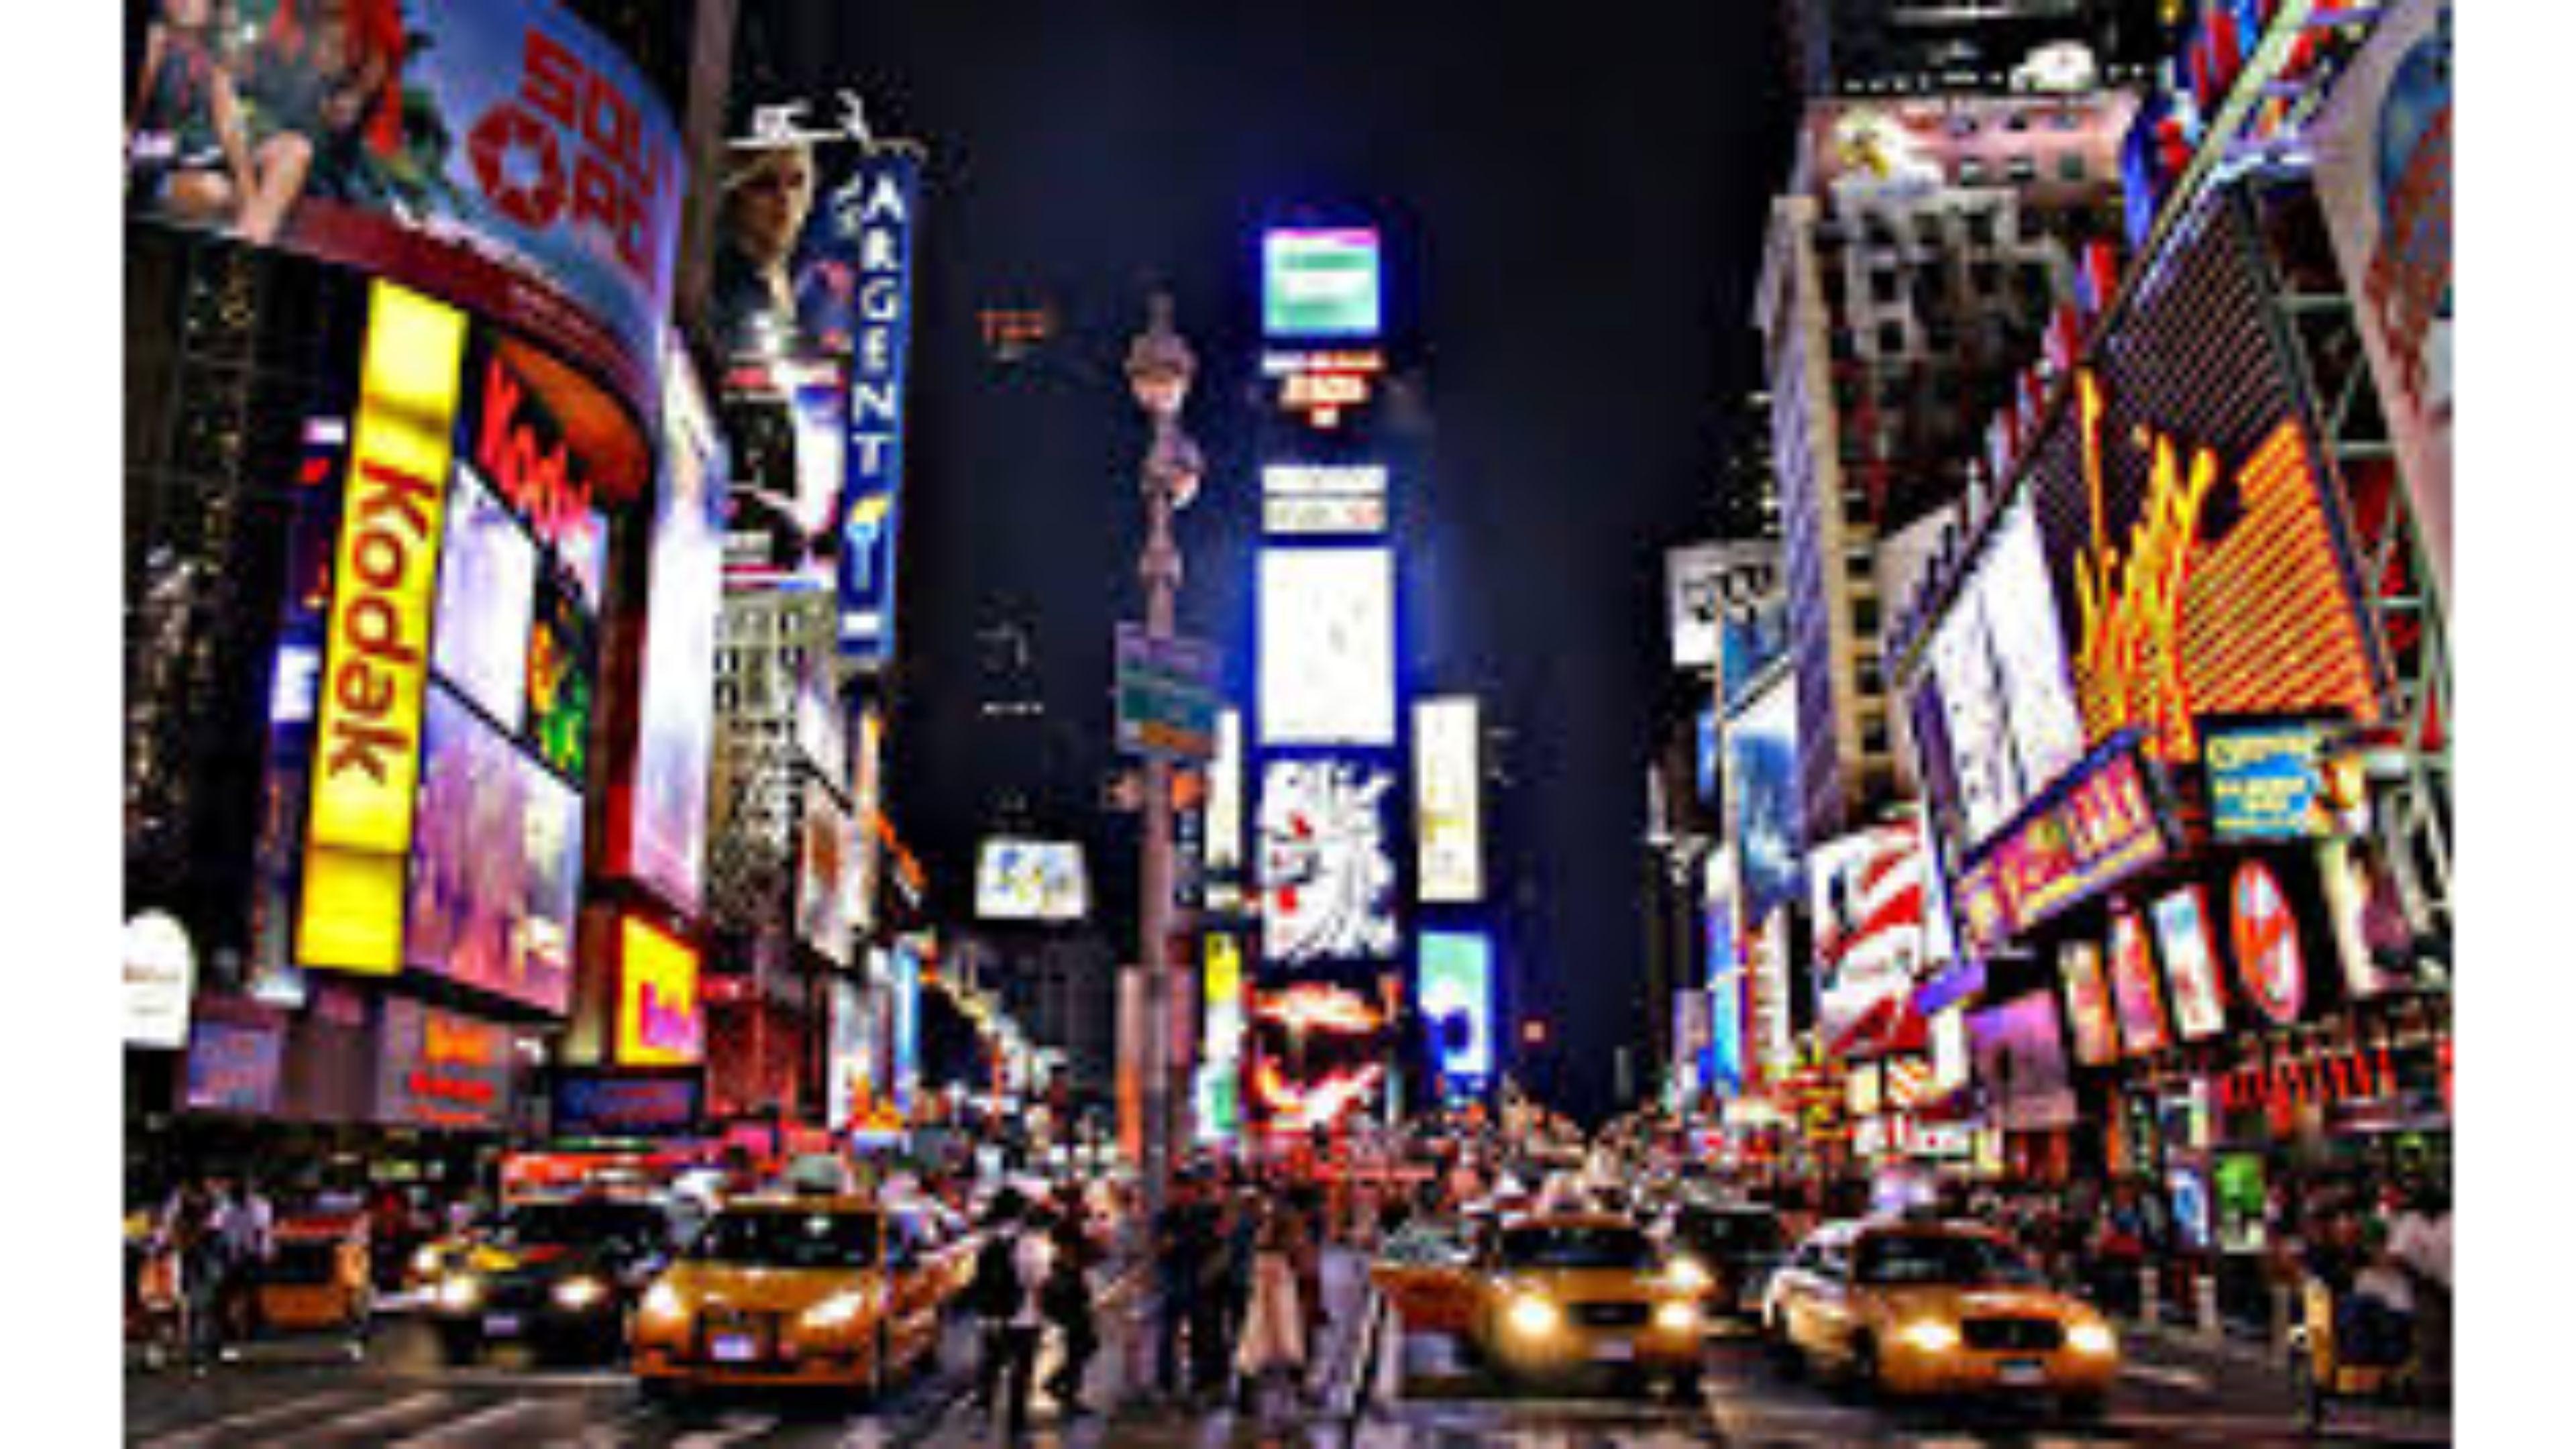 Vacation 2016 New York City 4K Wallpaper